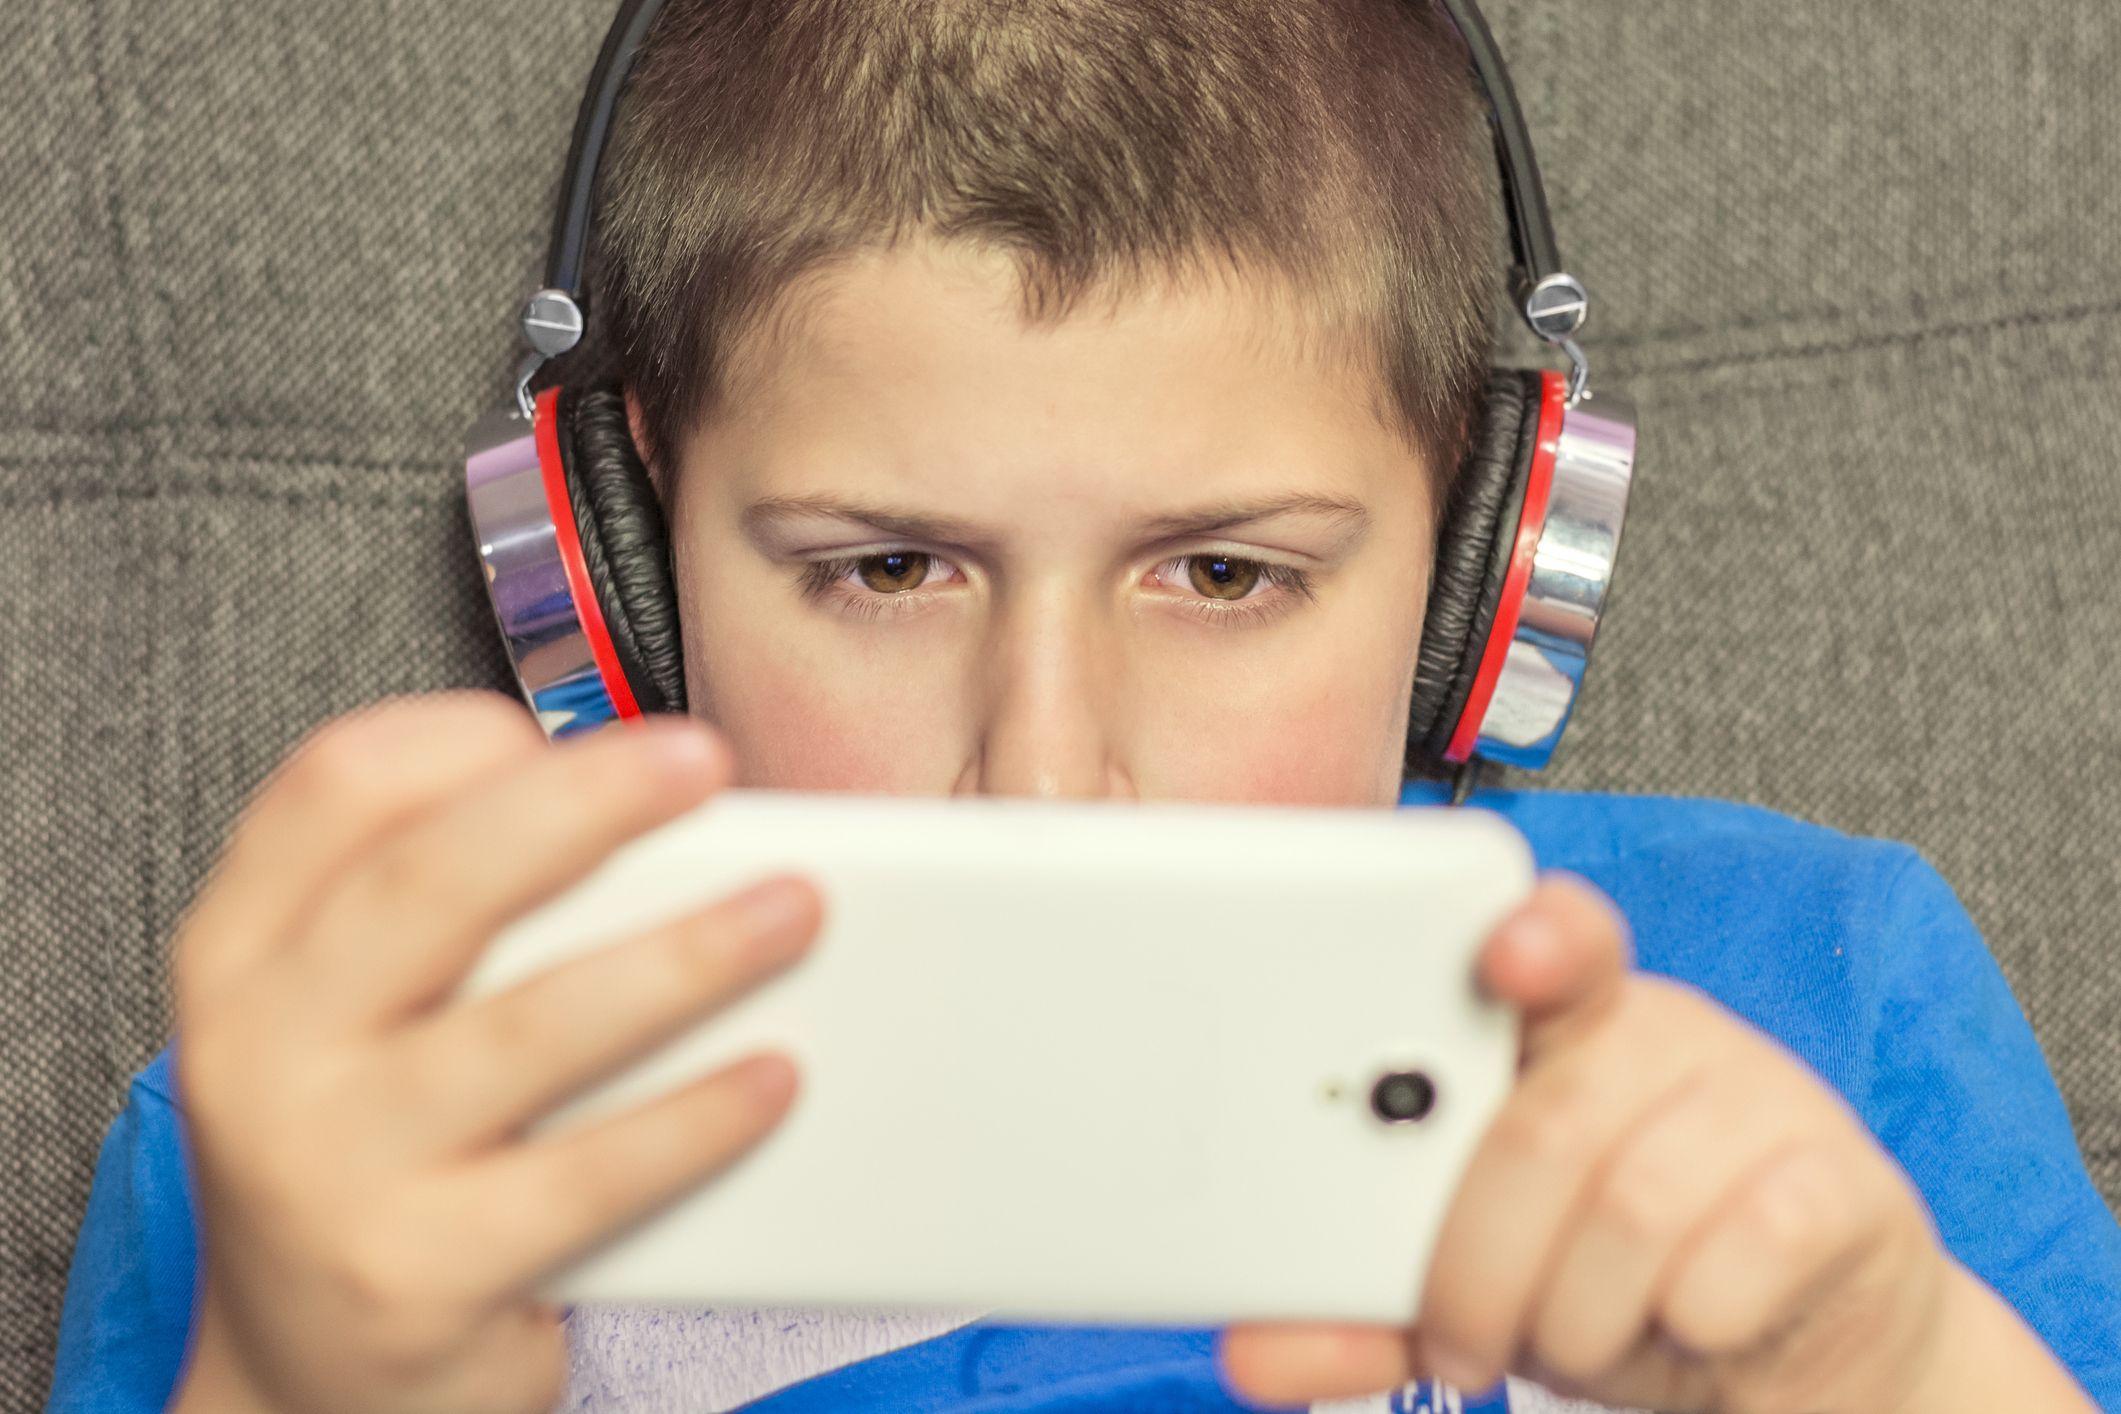 child-boy-teen-smartphone-social-media-stock